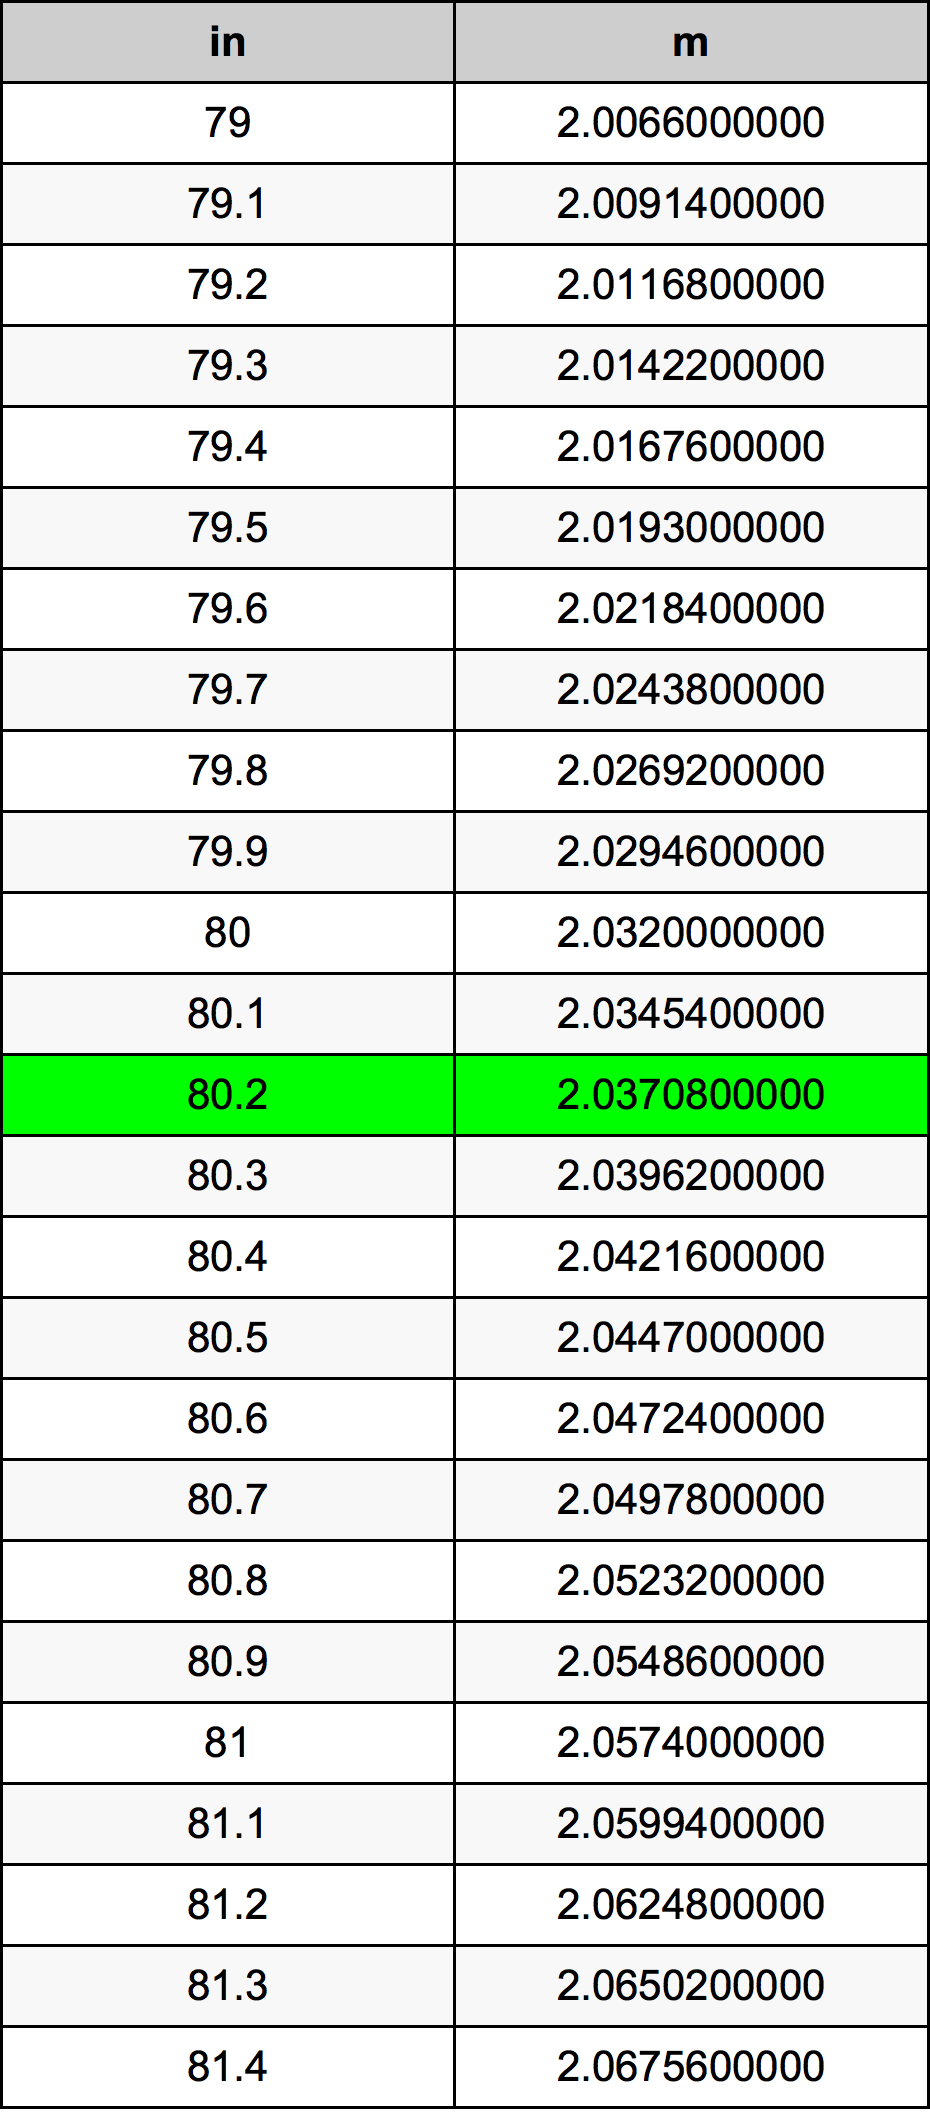 80.2 Inch konverteringstabell